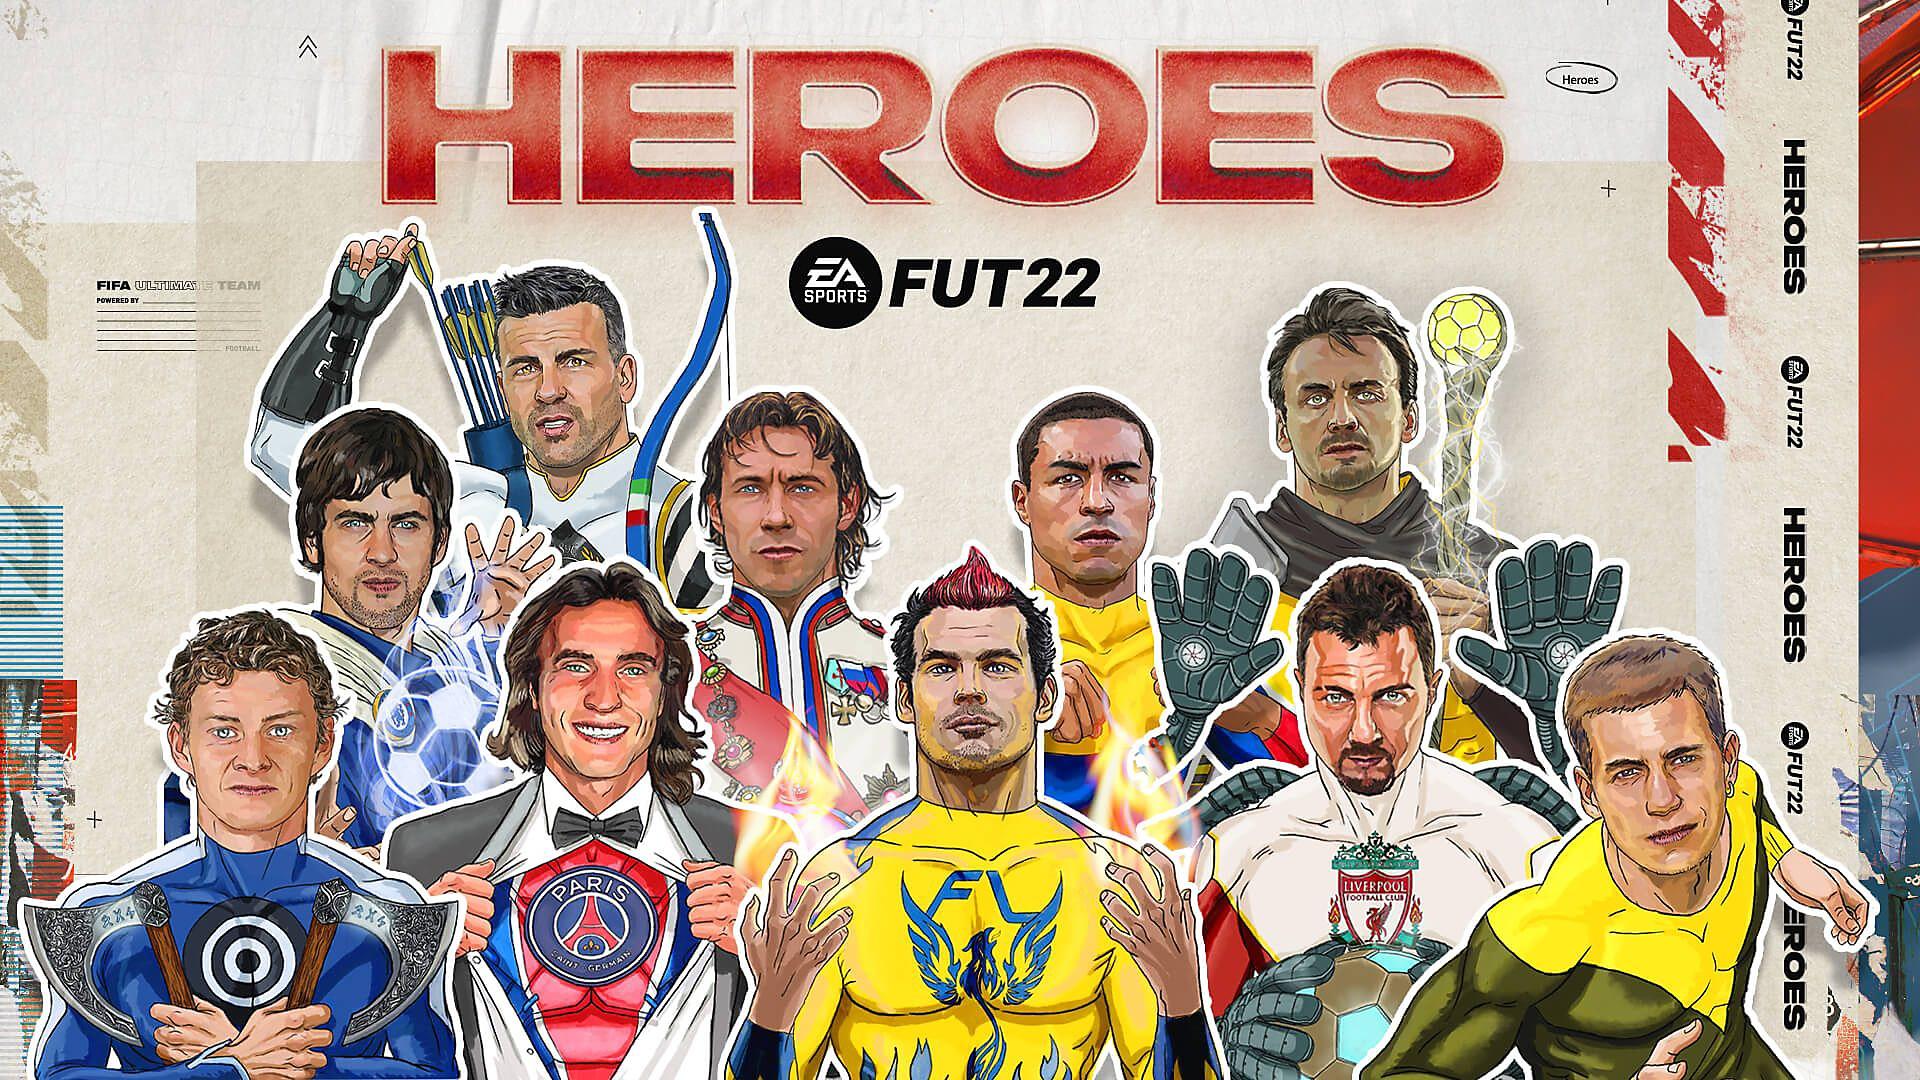 FUT Heroes